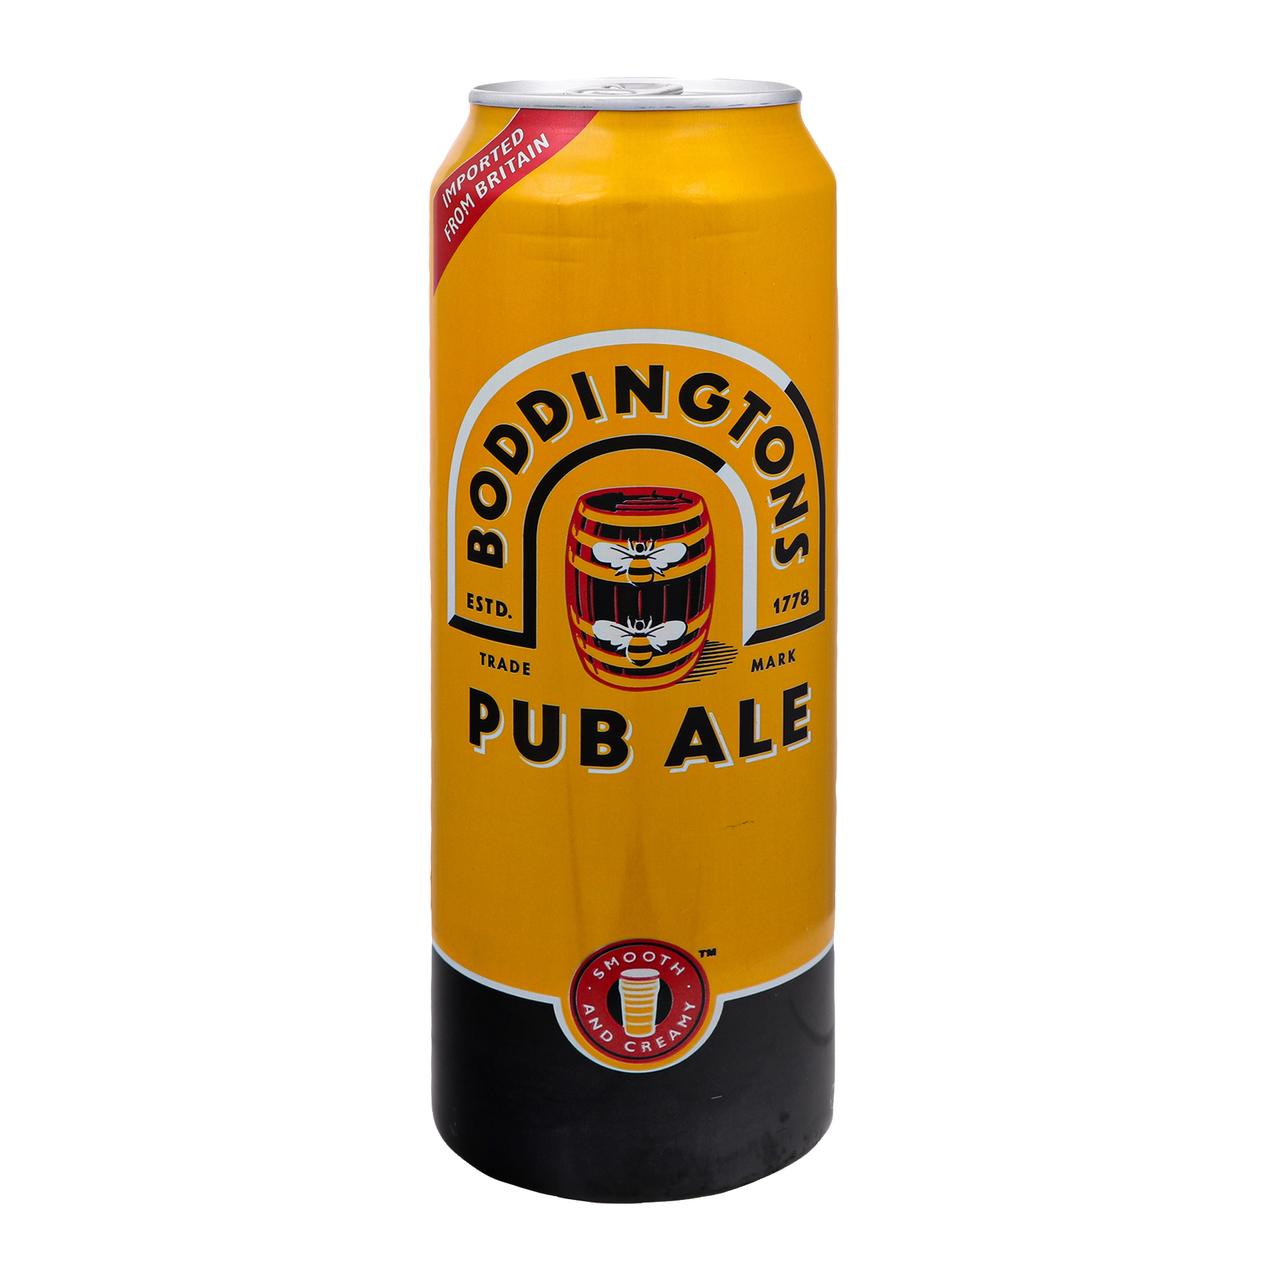 Пиво Boddingtons Pub ale світле пастеризоване 4.6% 0.5л